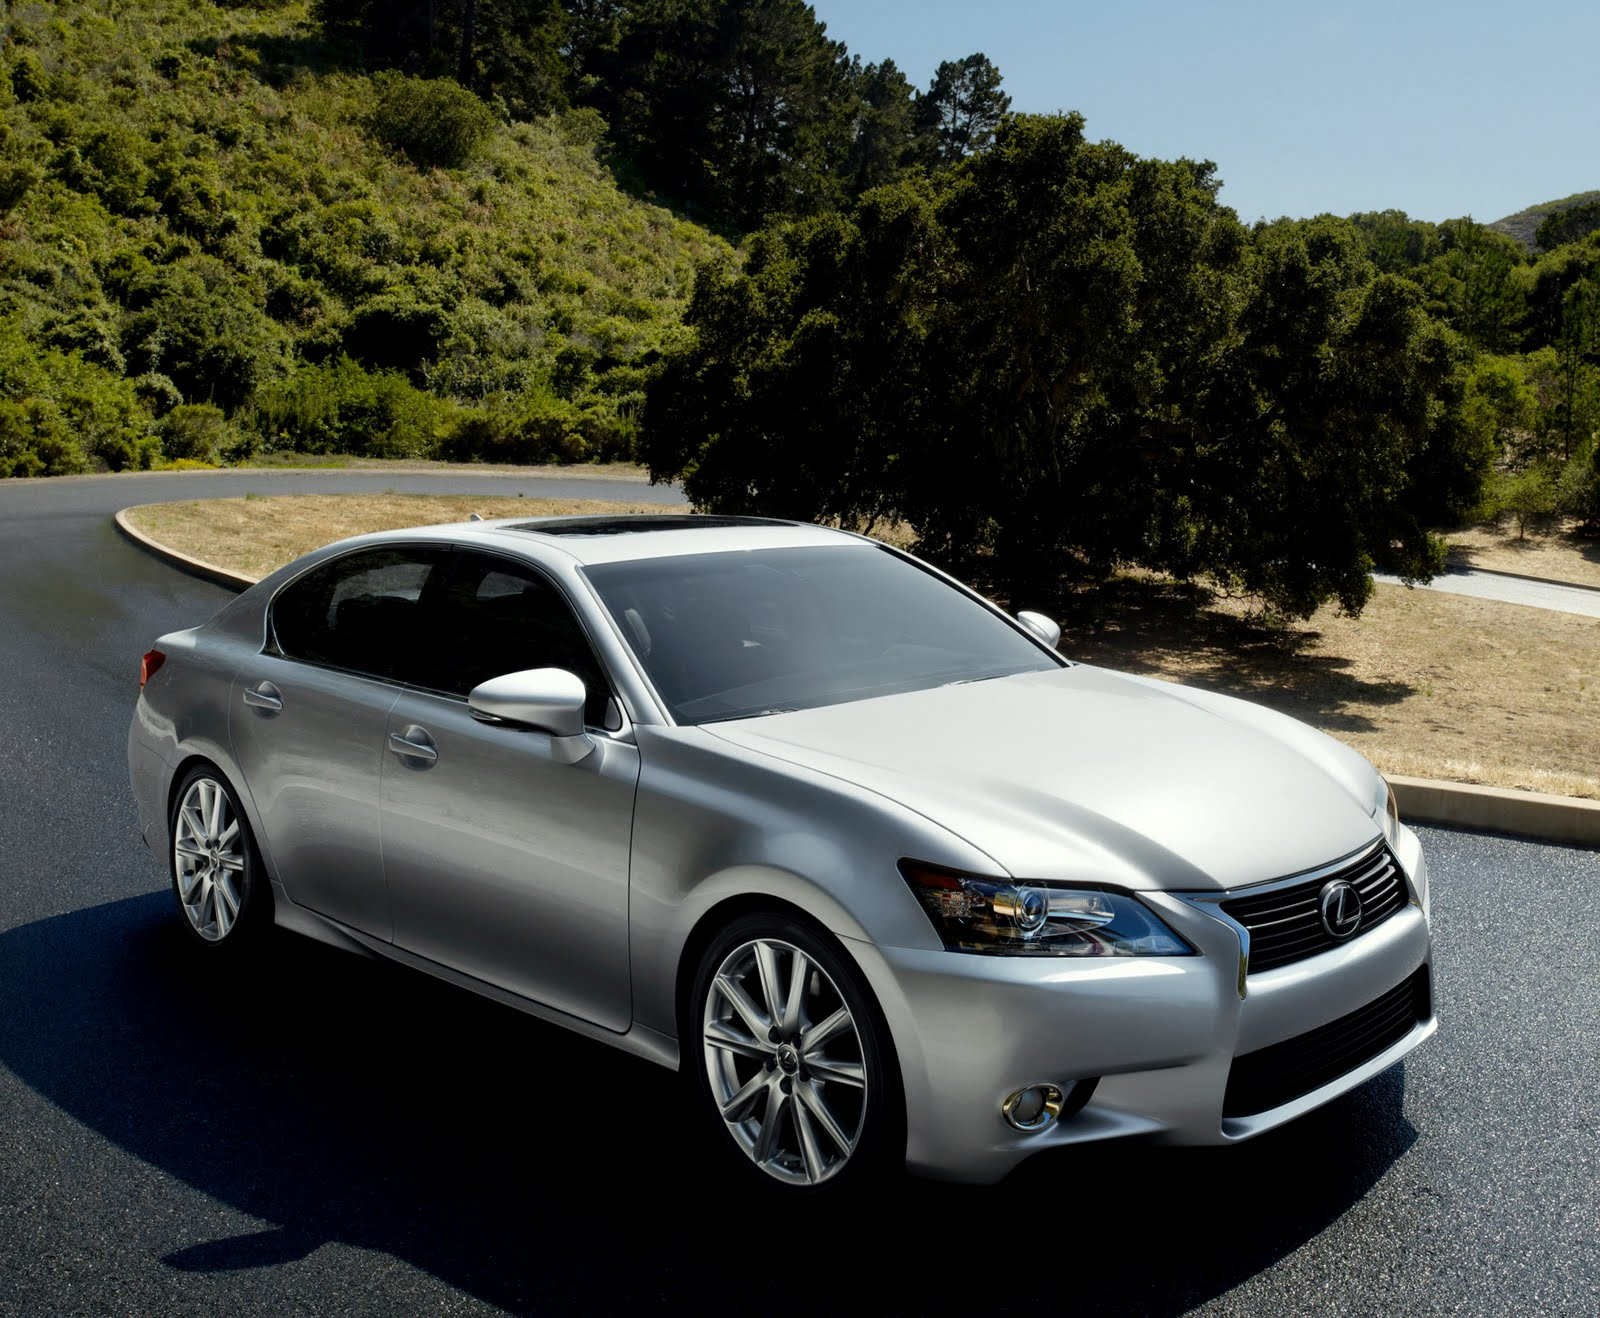 uautoknow 2013 Lexus GS 350 revealed